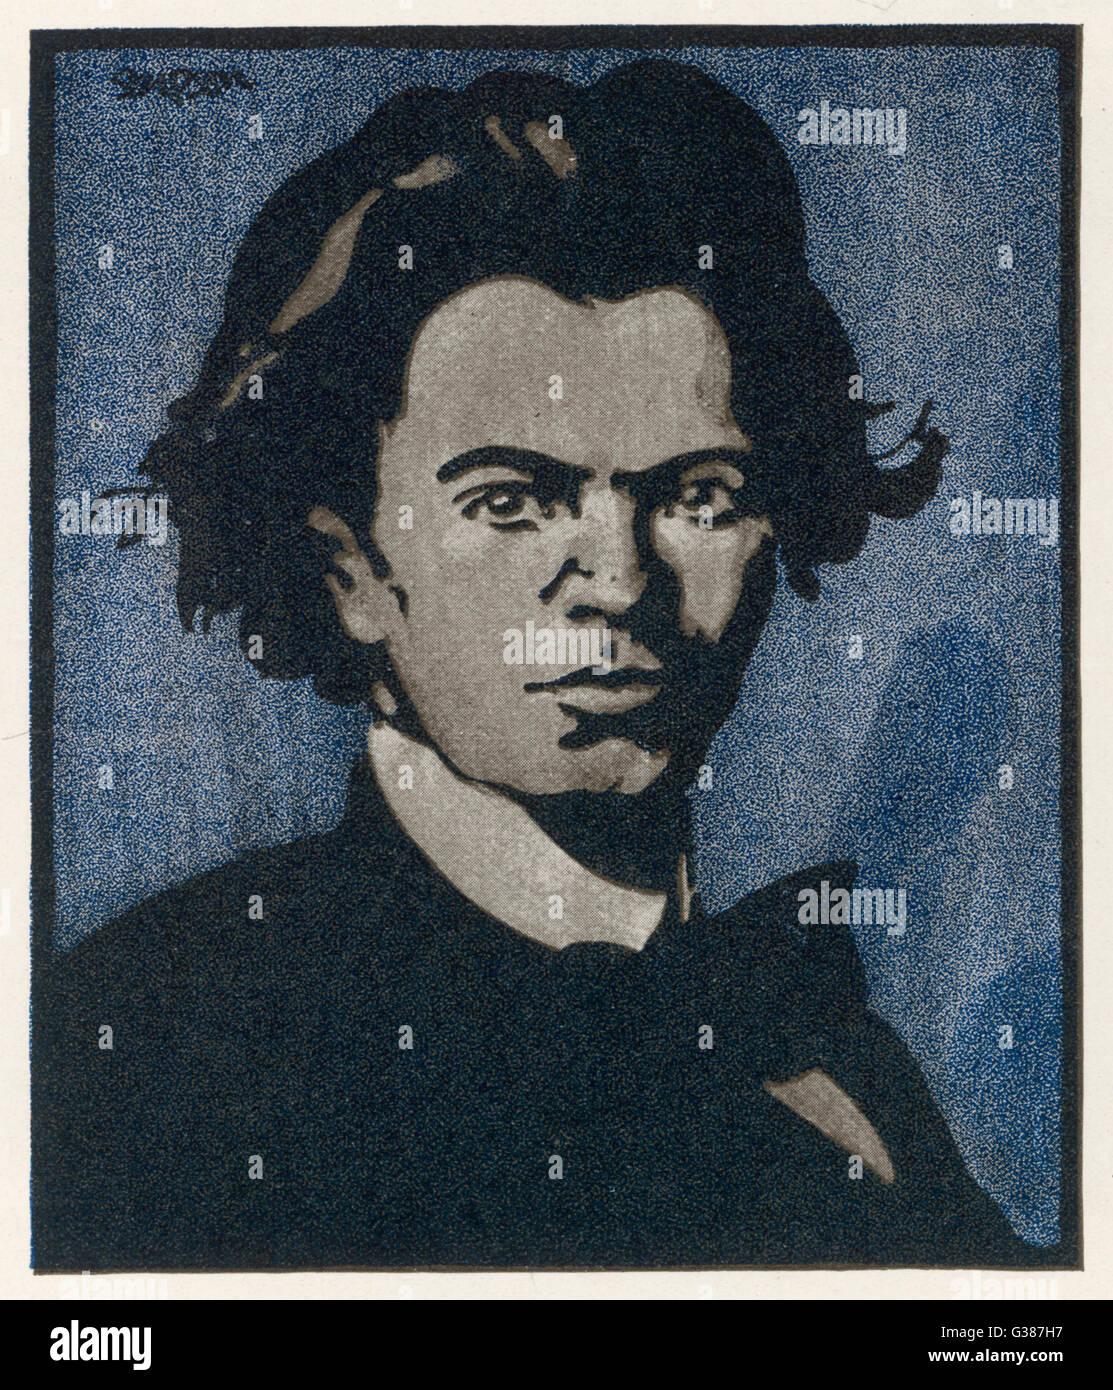 JAN KUBELIK  Czech musician        Date: 1880 - 1940 - Stock Image